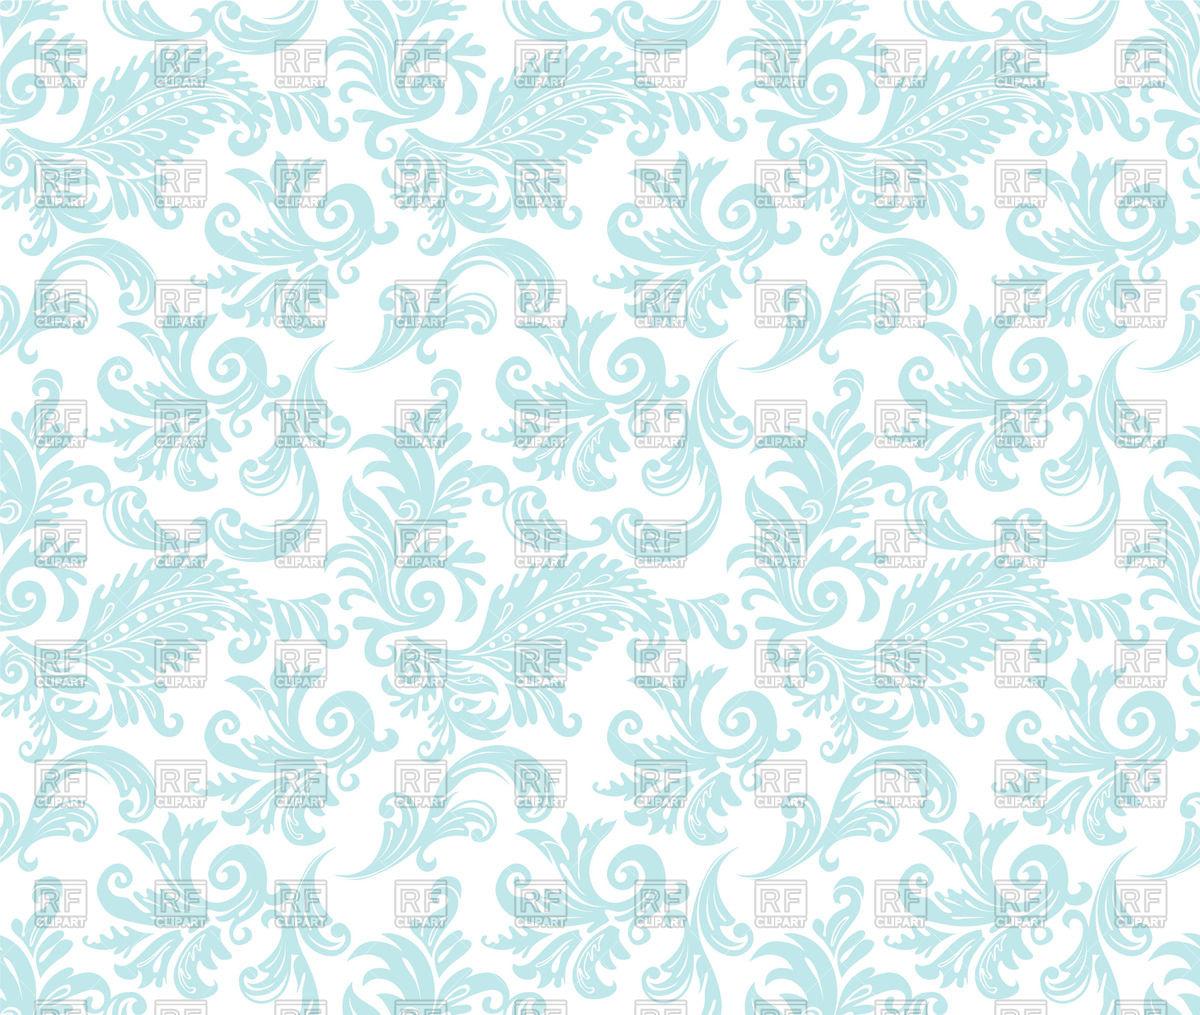 Blue damask seamless wallpaper Vector Image #58940.